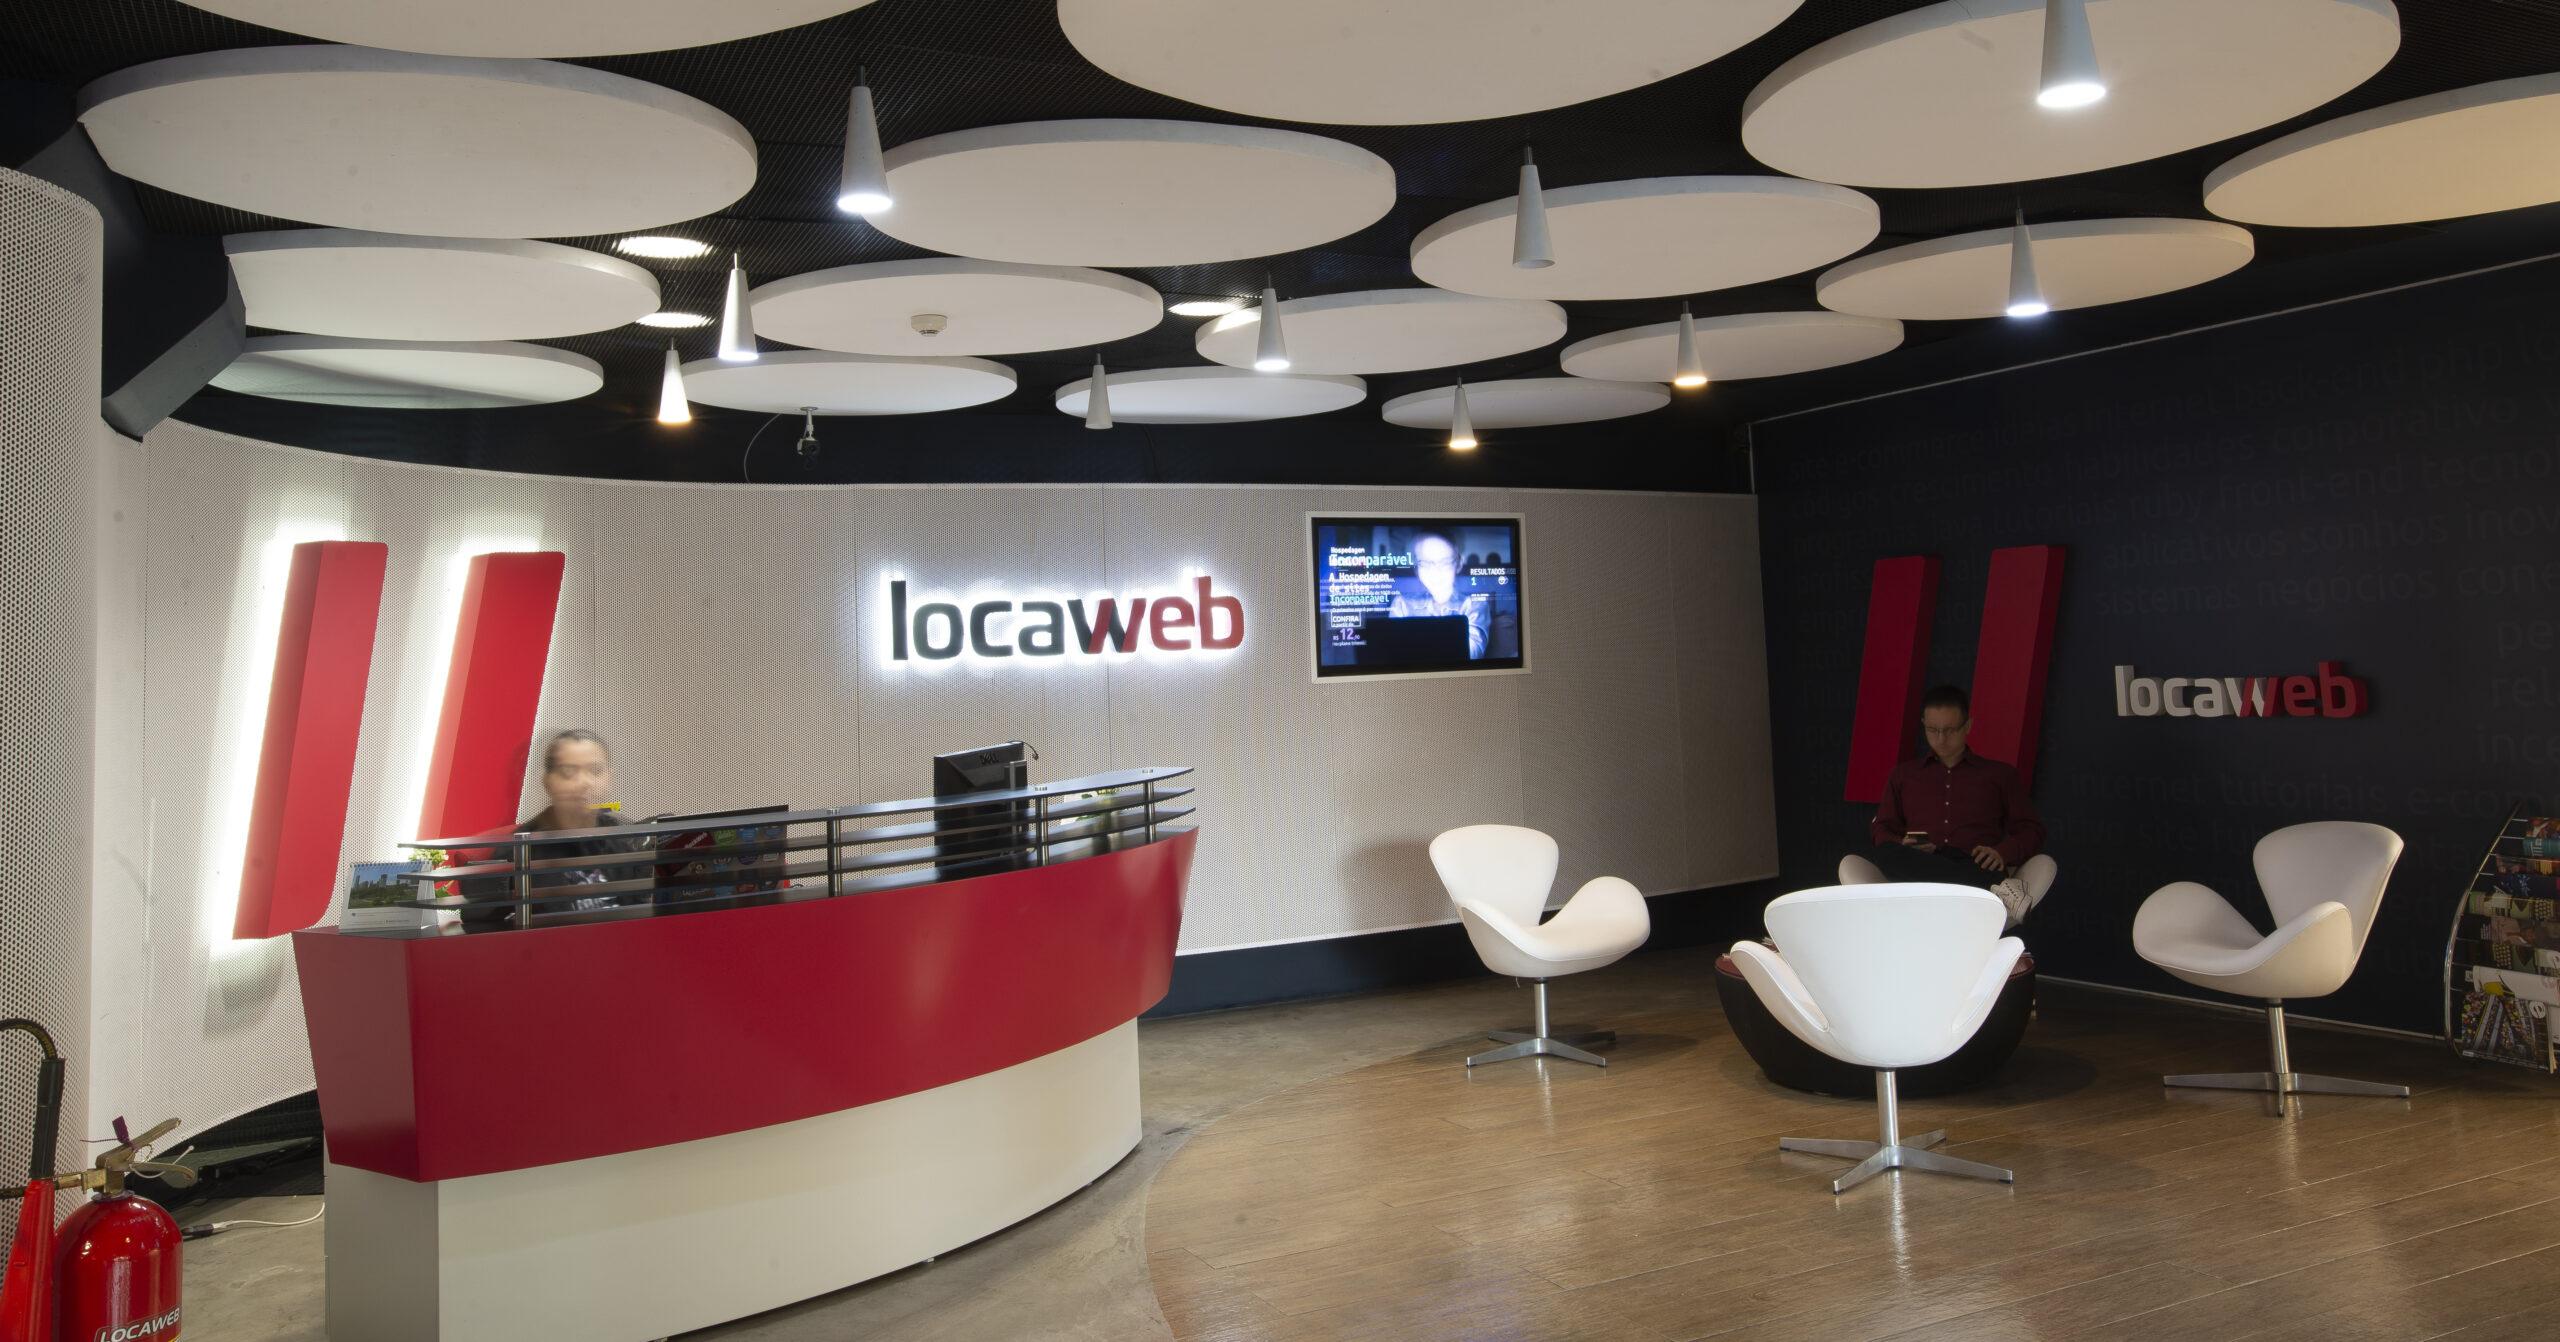 Locaweb (LWSA3)